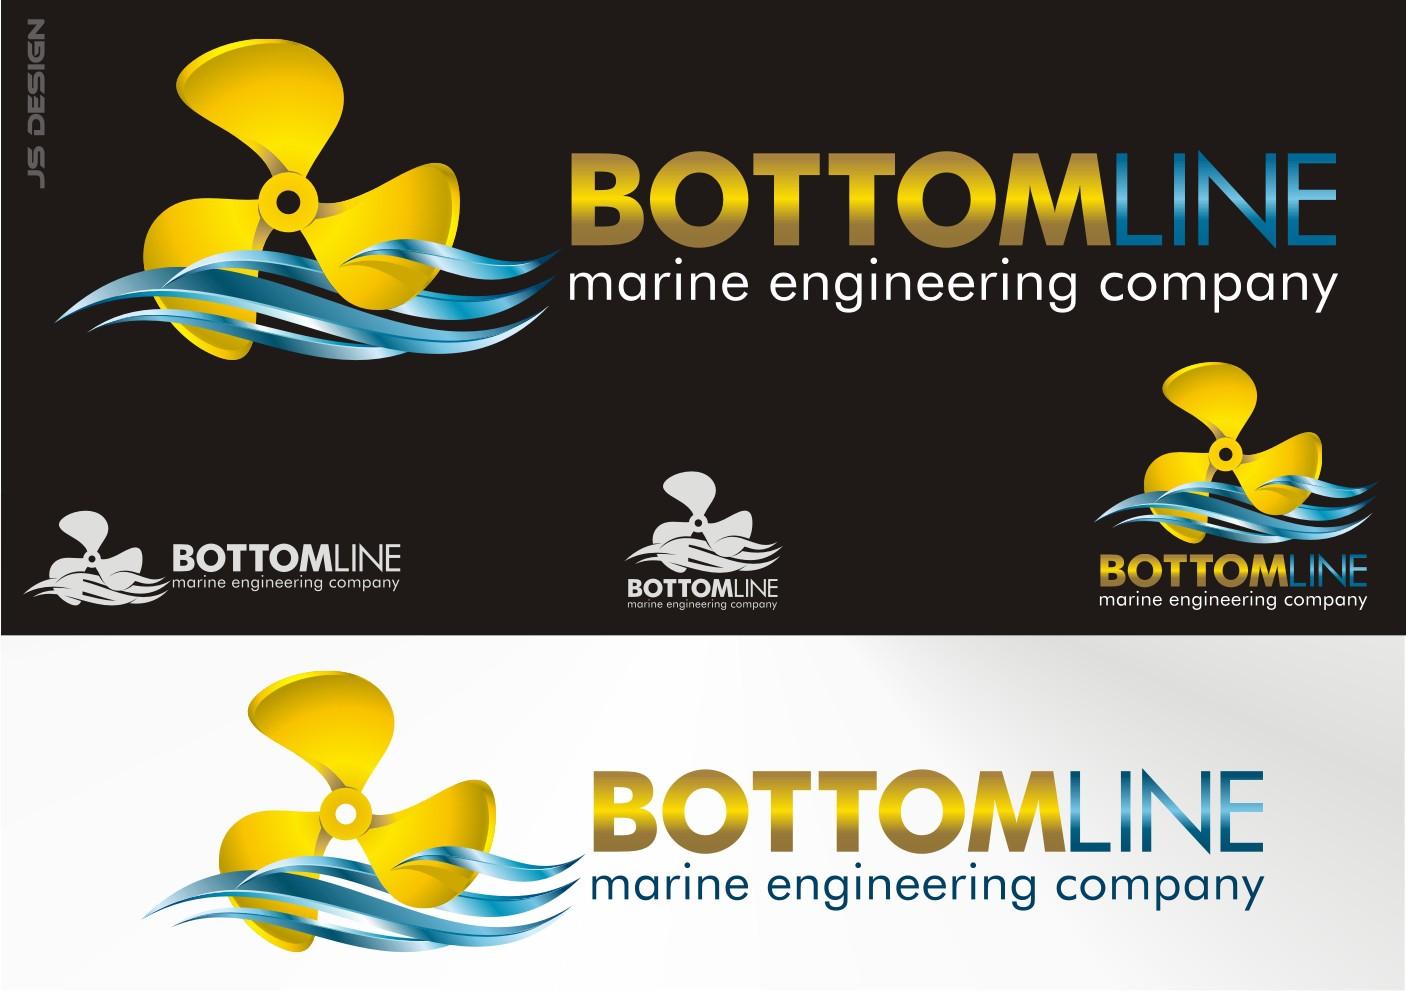 Create the new logo for Bottomline Marine engineering